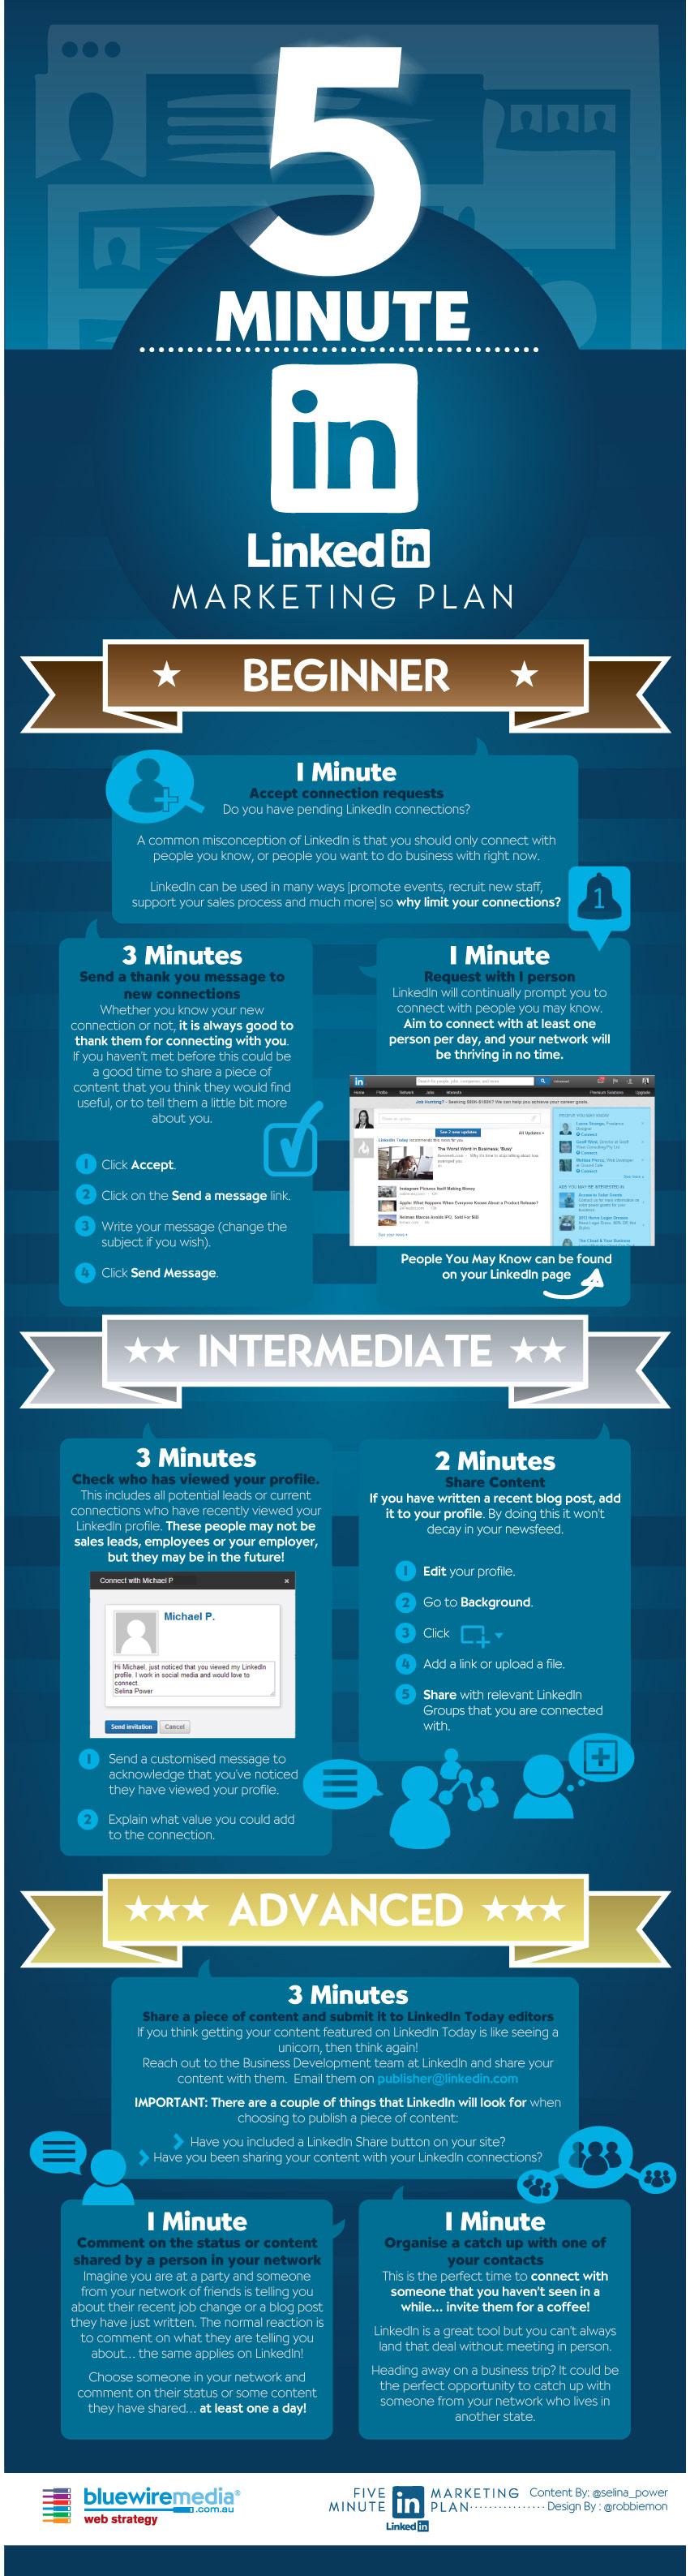 Plan de marketing en Linkedin en 5 minutos